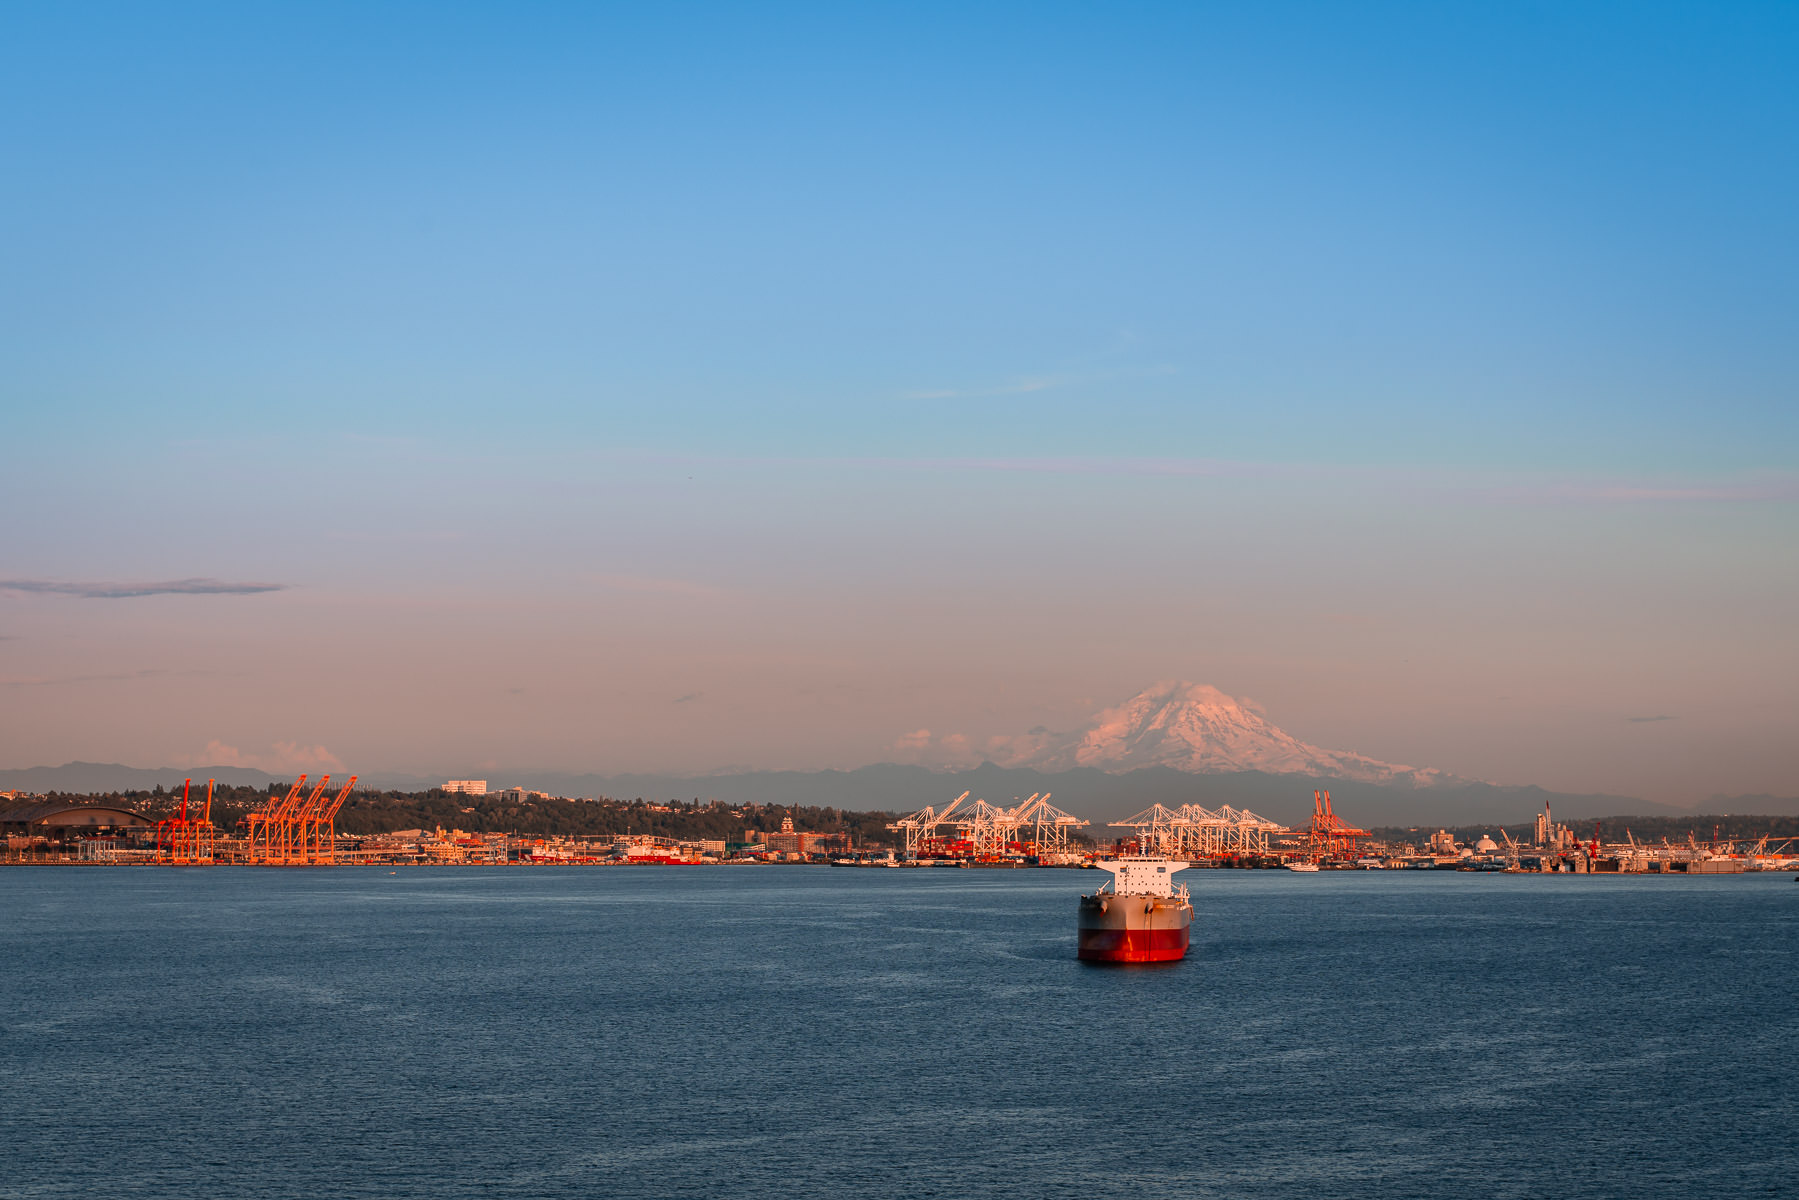 Mount Rainier rises over the Port of Seattle.